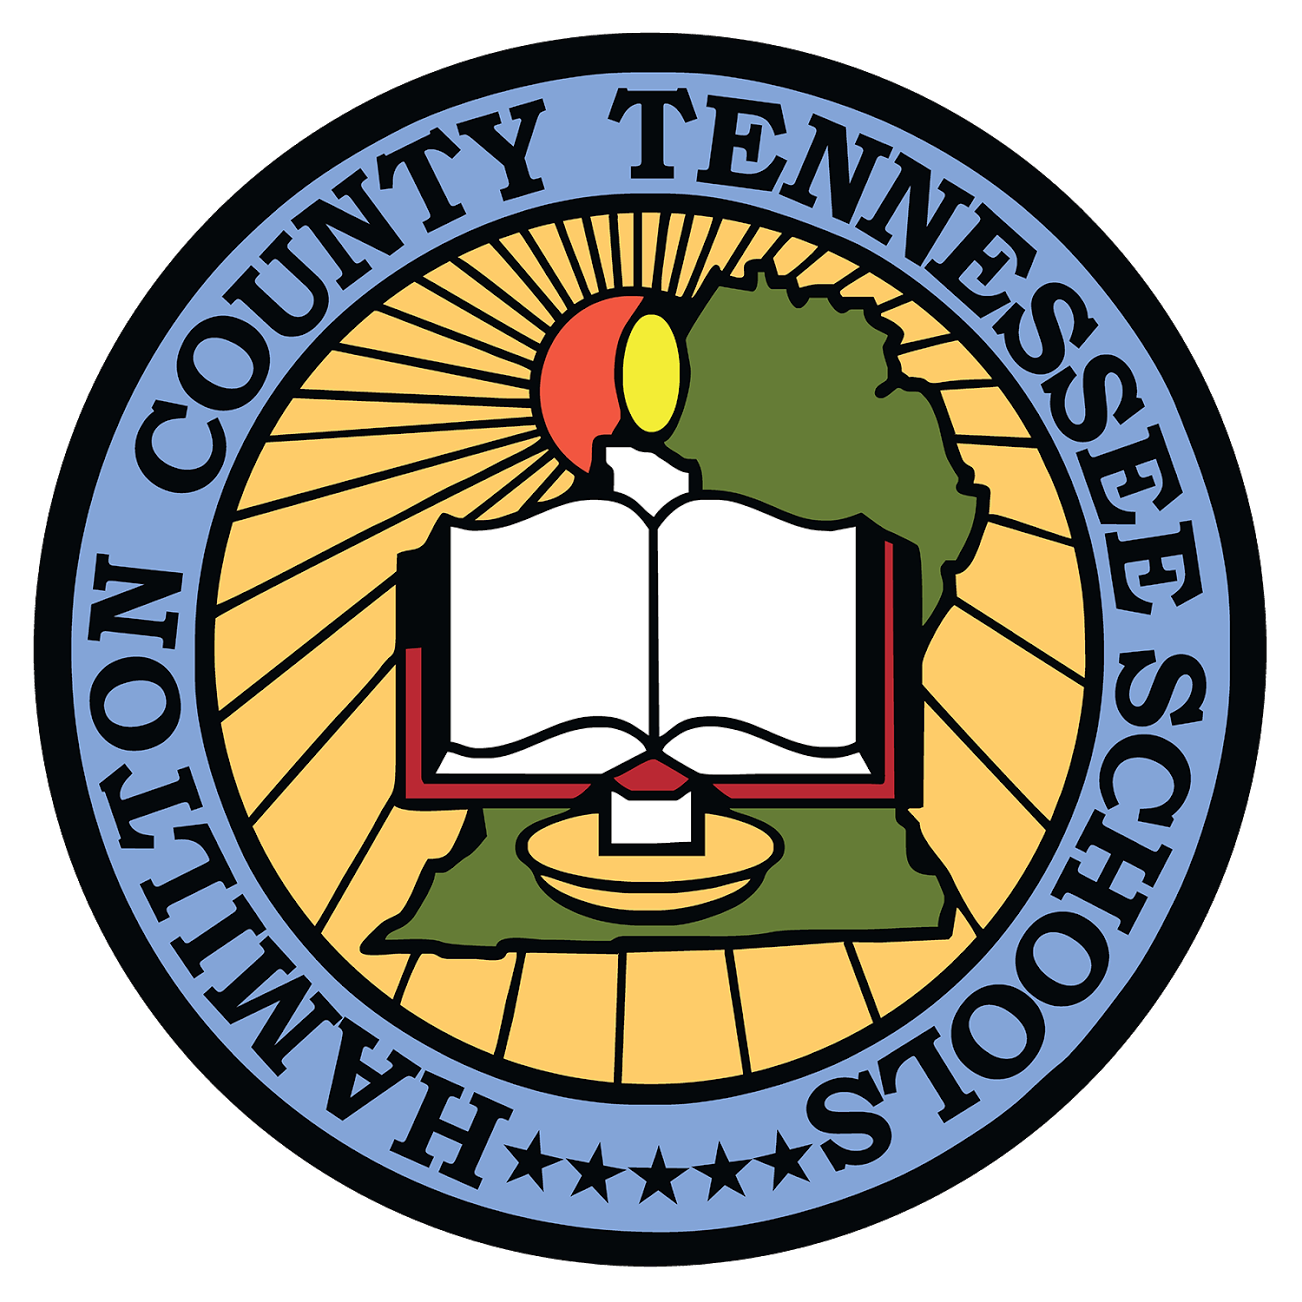 Hamilton County Department of Education